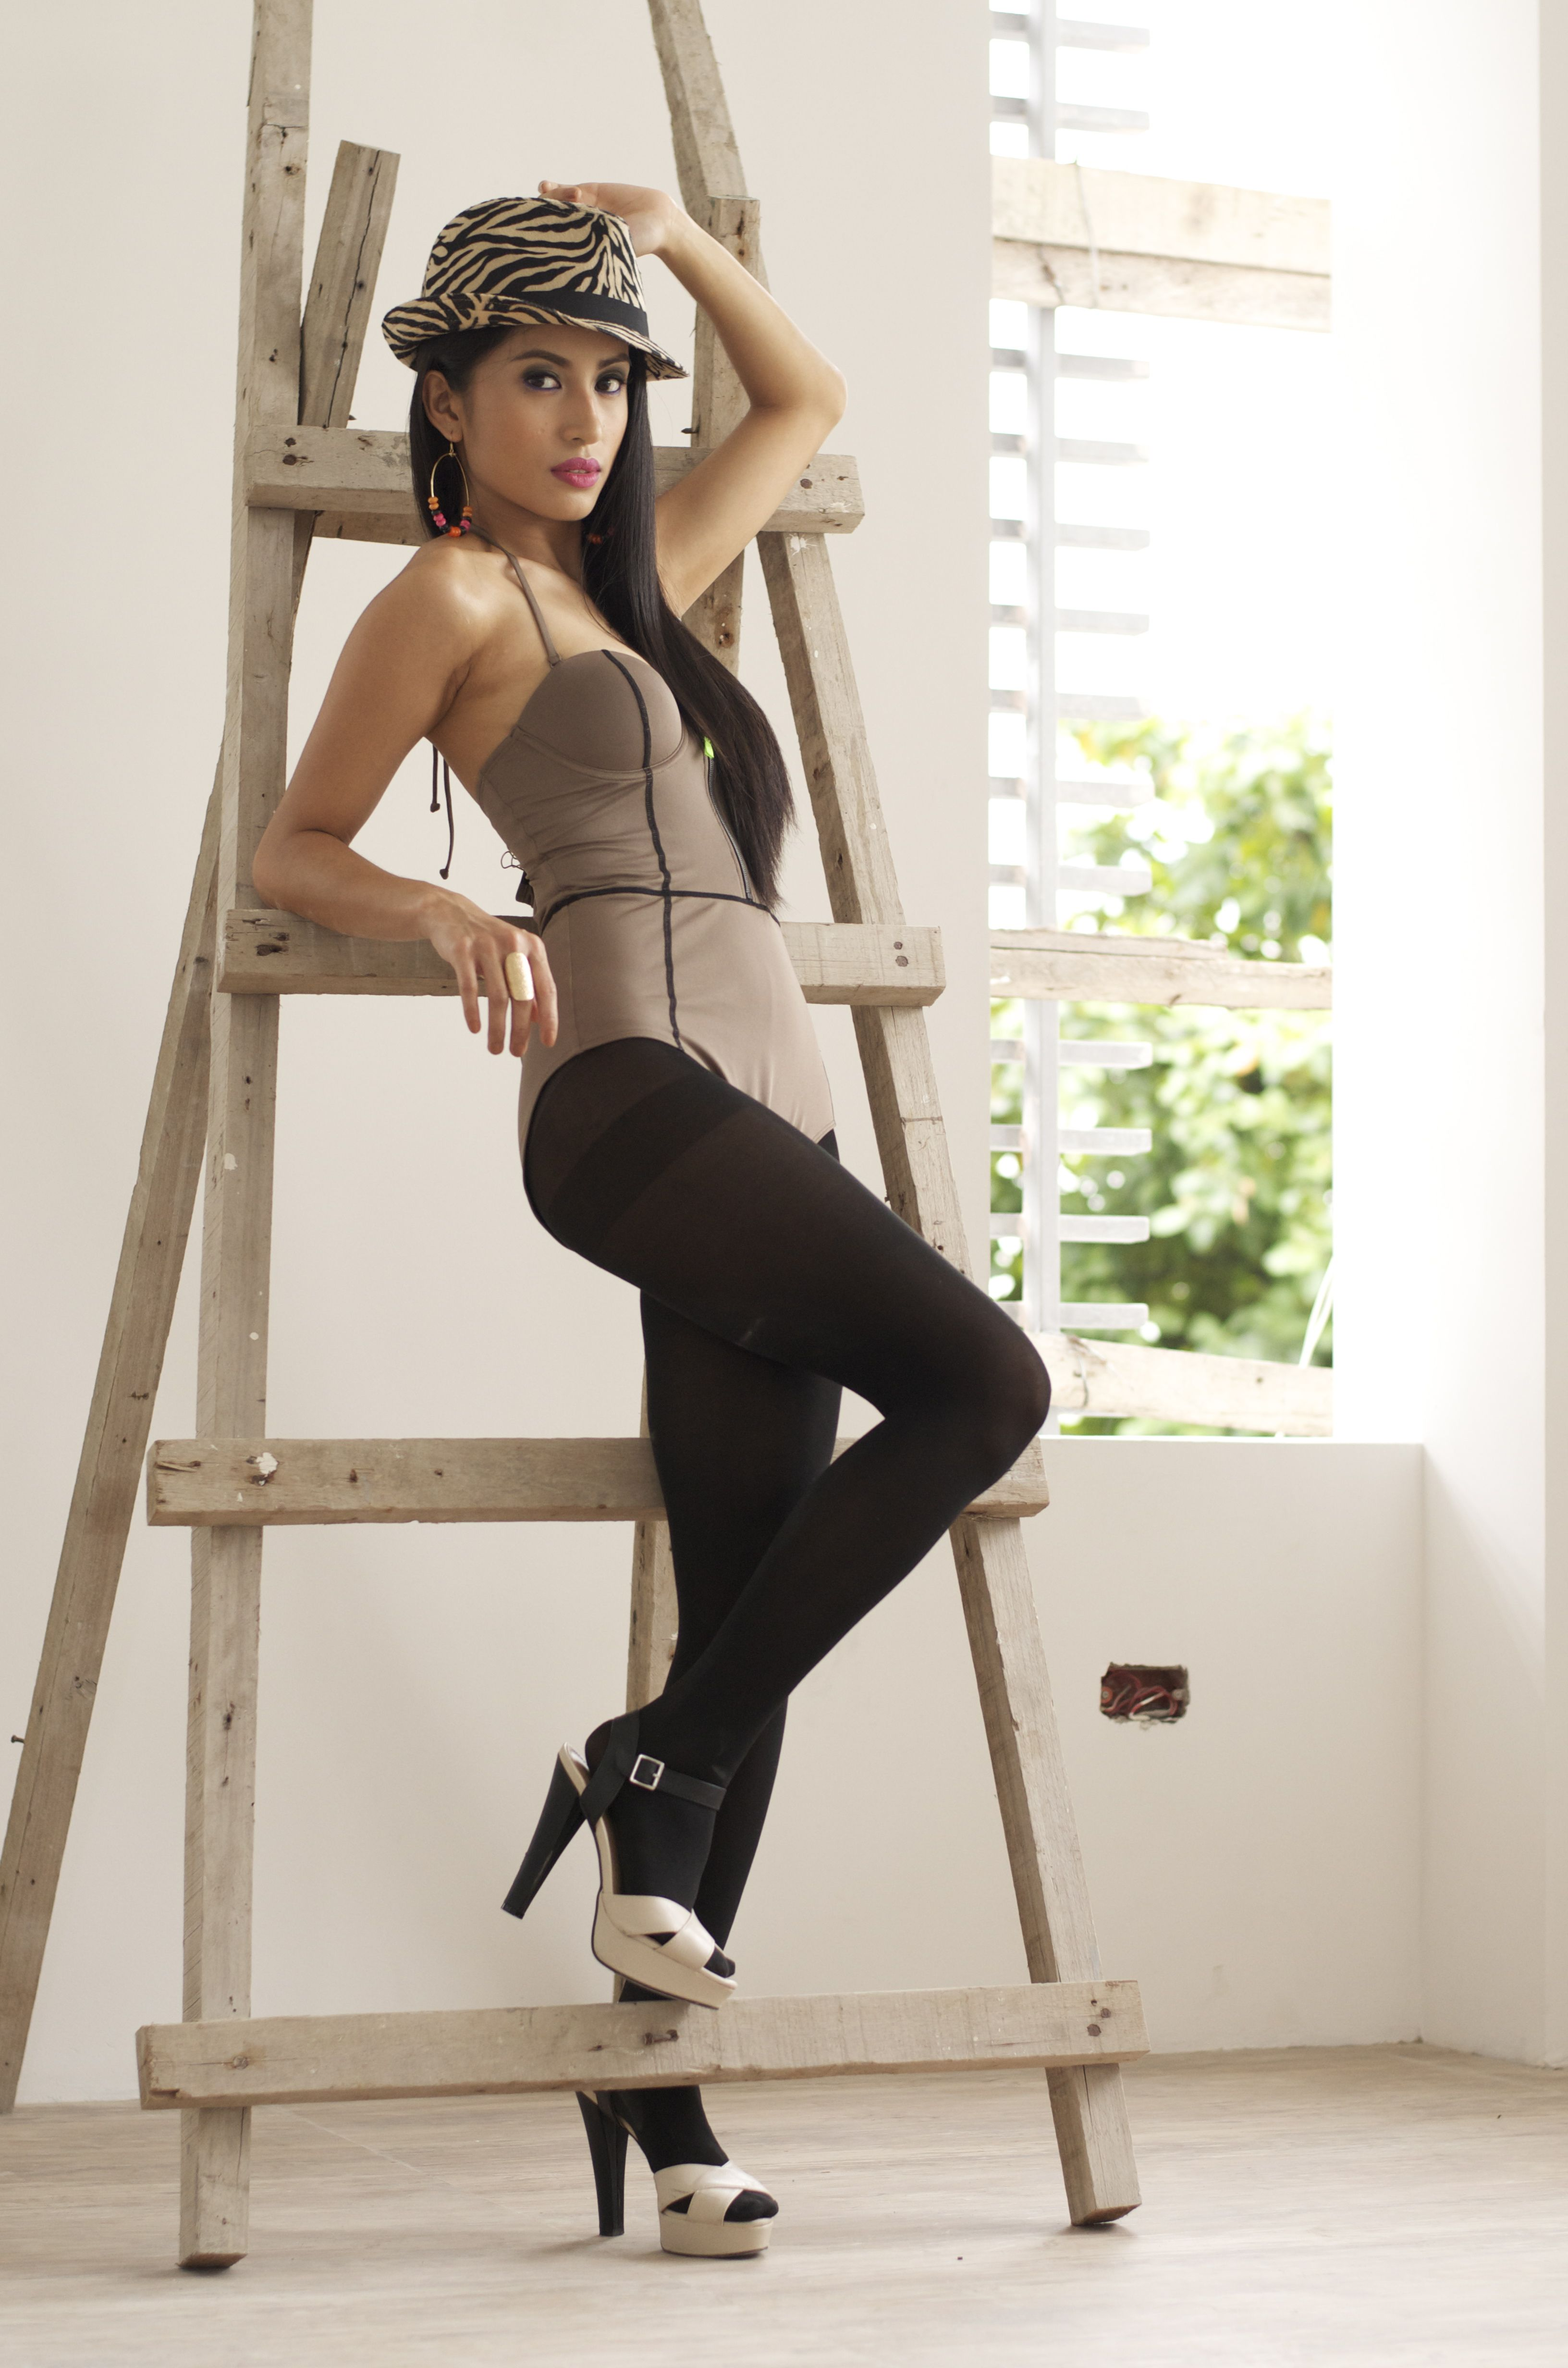 Model: CAMILLE MENDOZA Photo: REY FERNANDEZ Hair&makeup: MISSY RIVERA Stylist: IRISS MANGIO